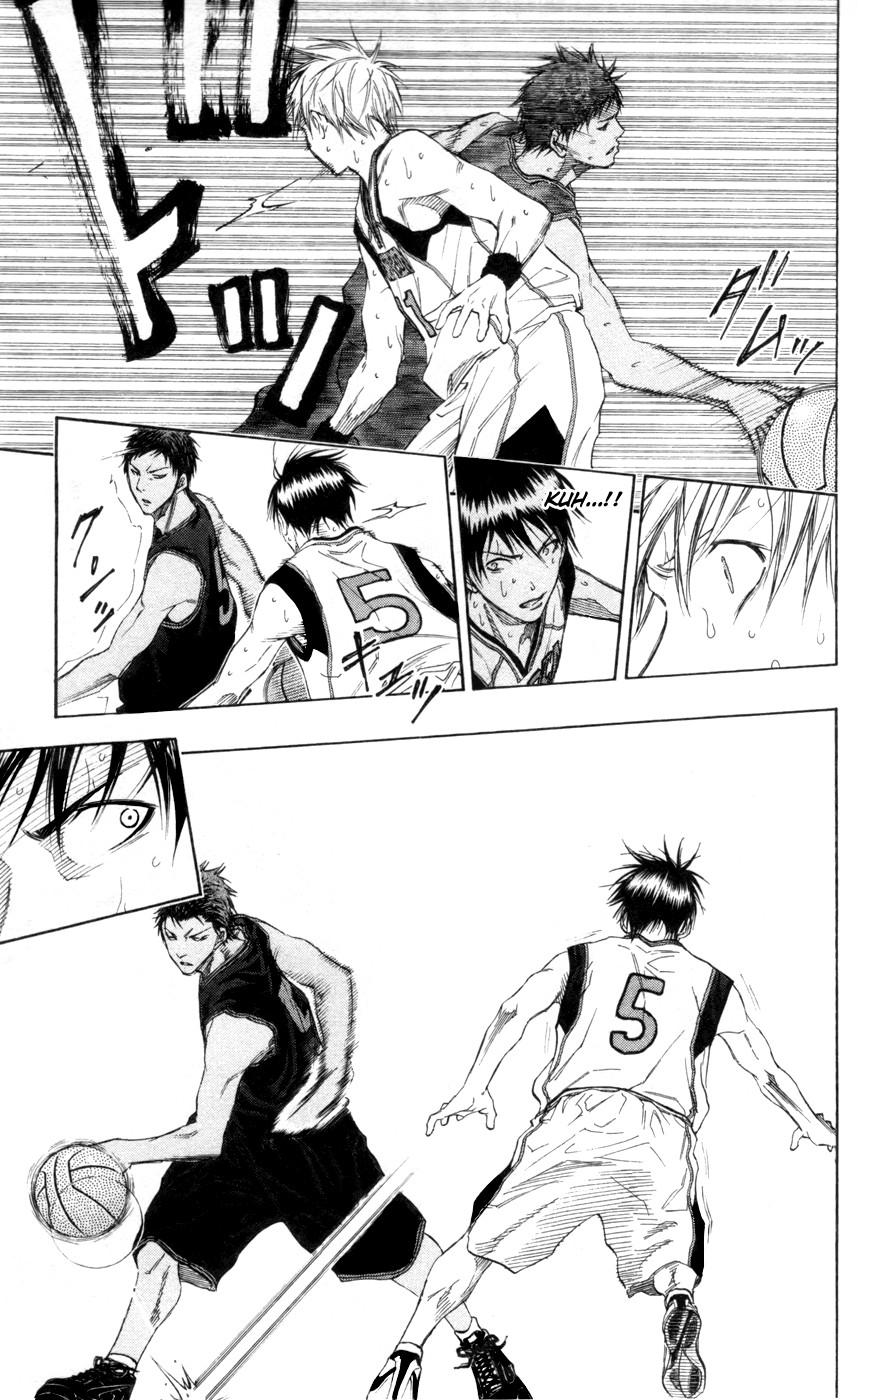 Kuroko no Basket Manga Chapter 120 - Image 11